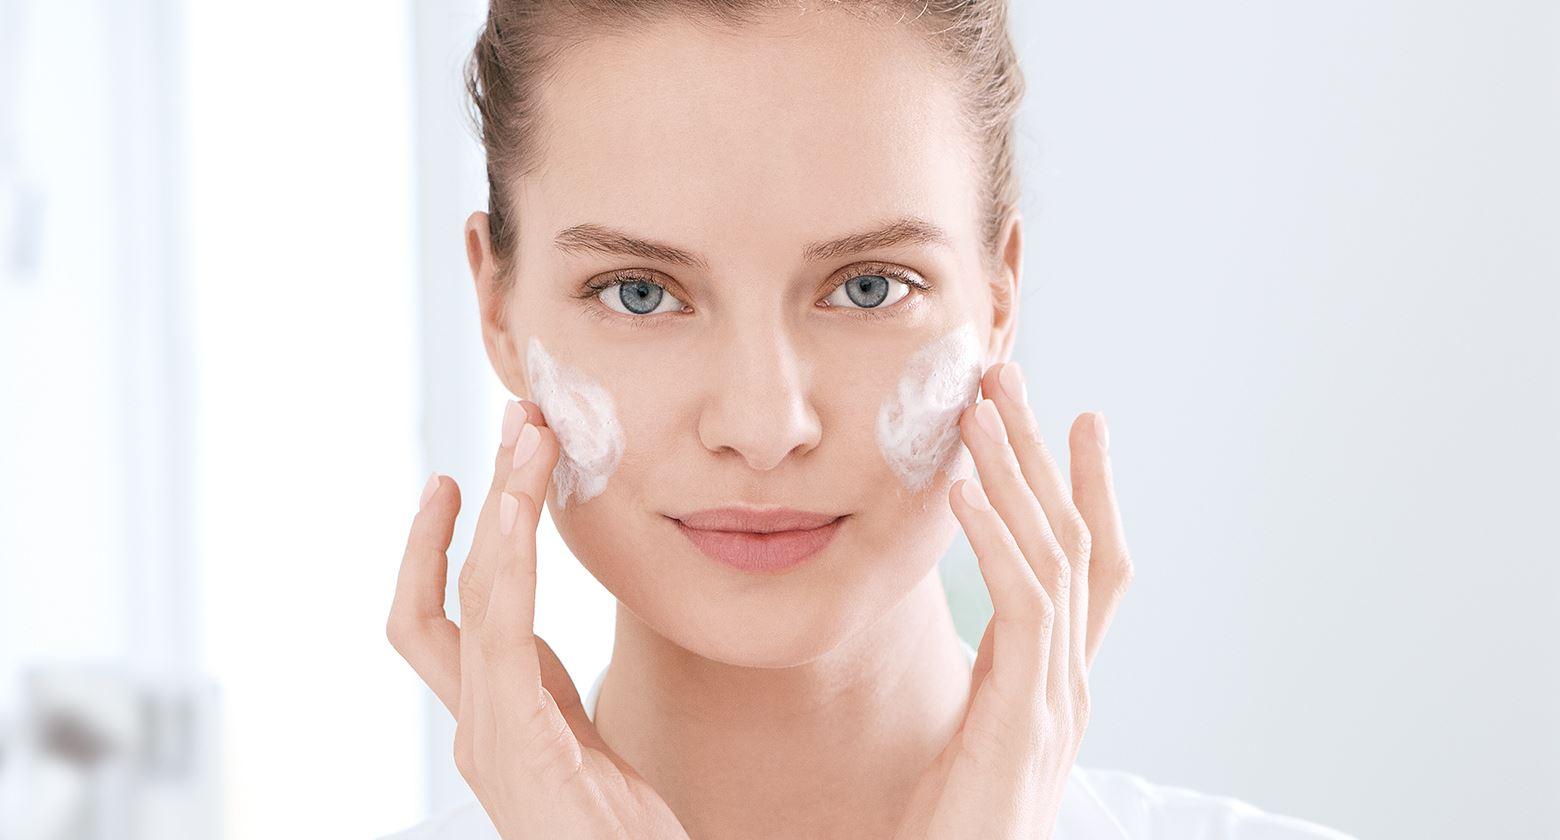 Eucerin-INT_DermoPure_Article_620-skin-care-routine_header-01